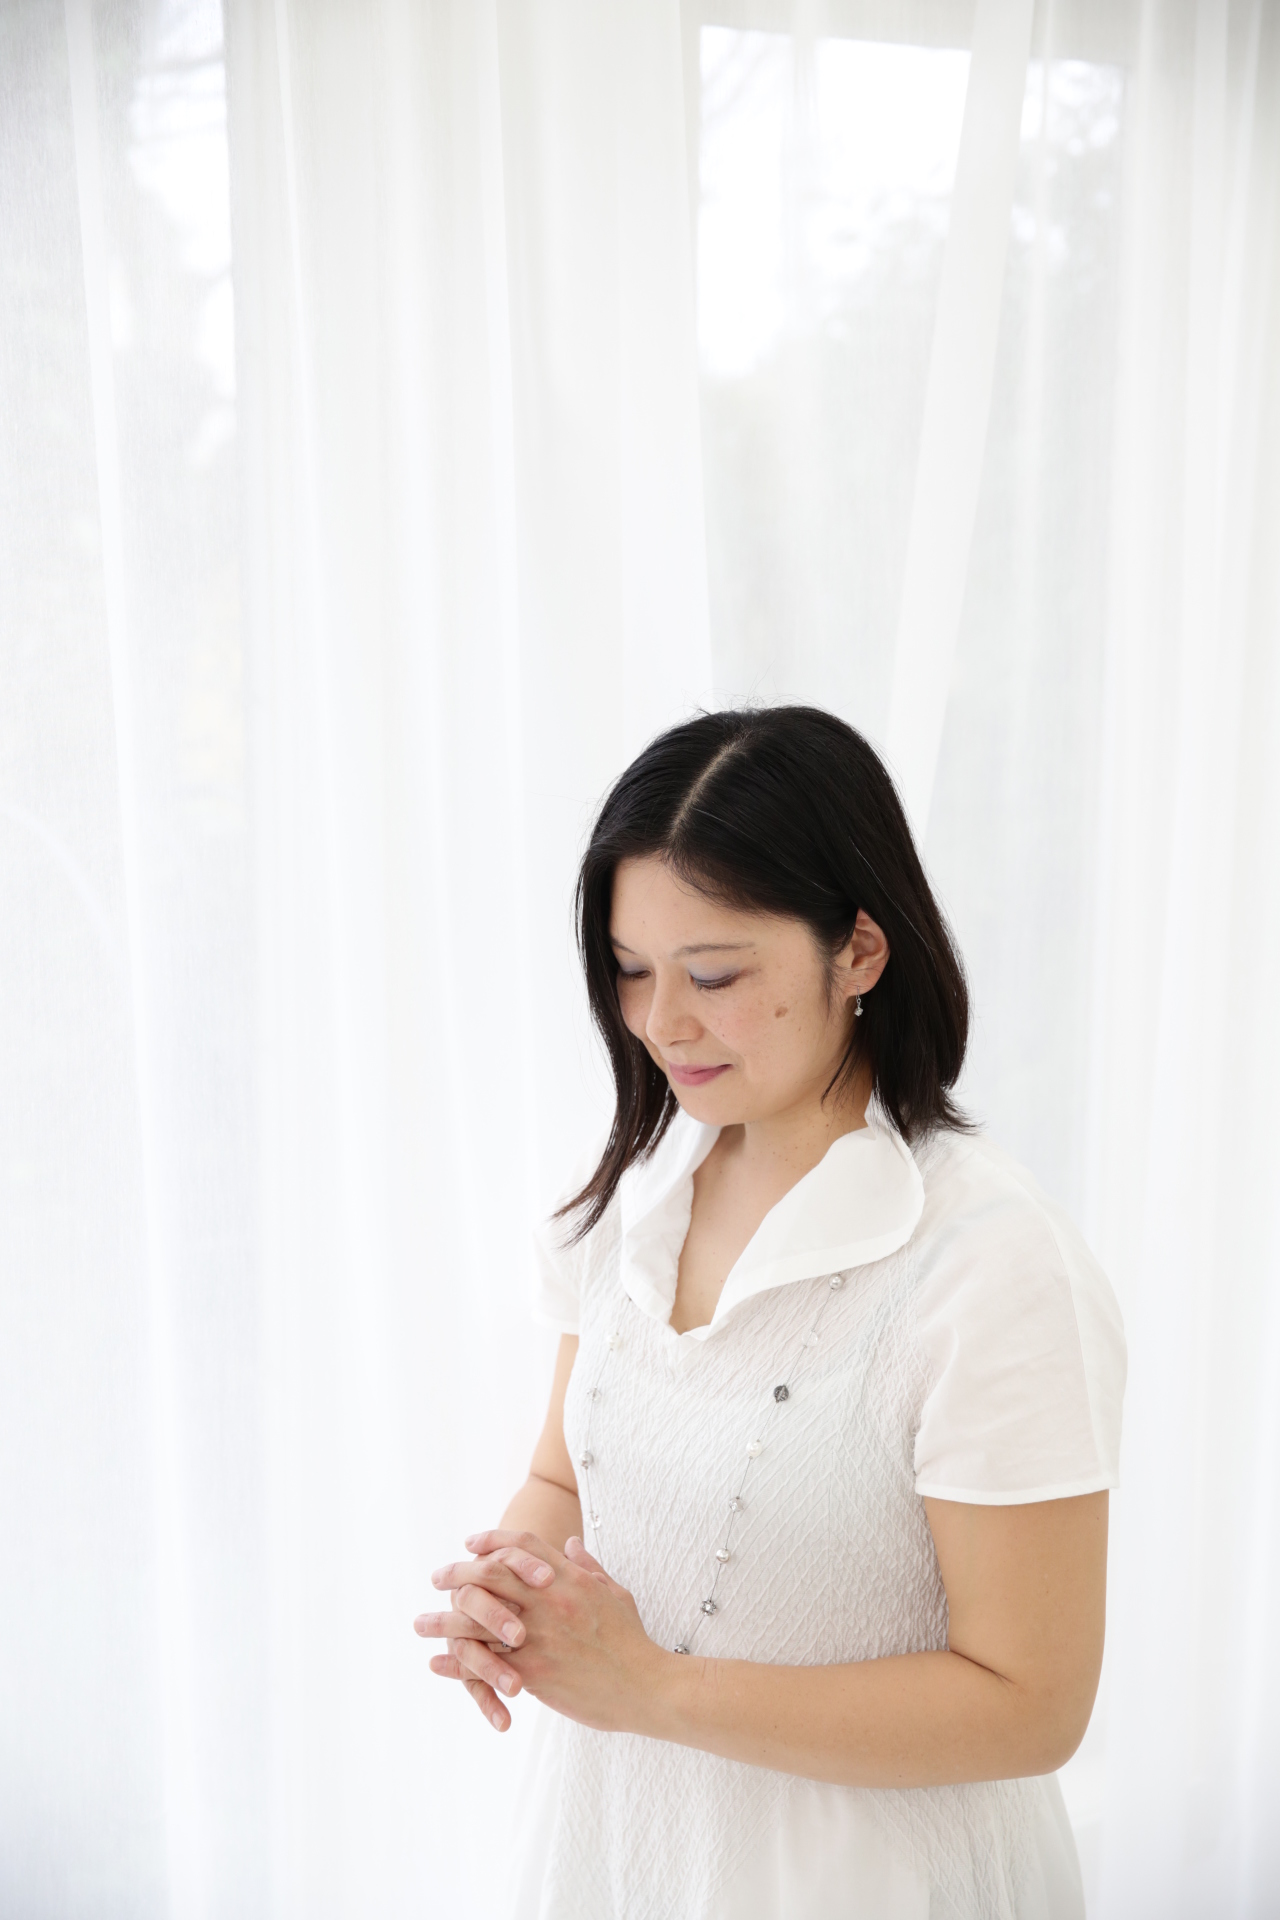 Mayumi Iida Stone